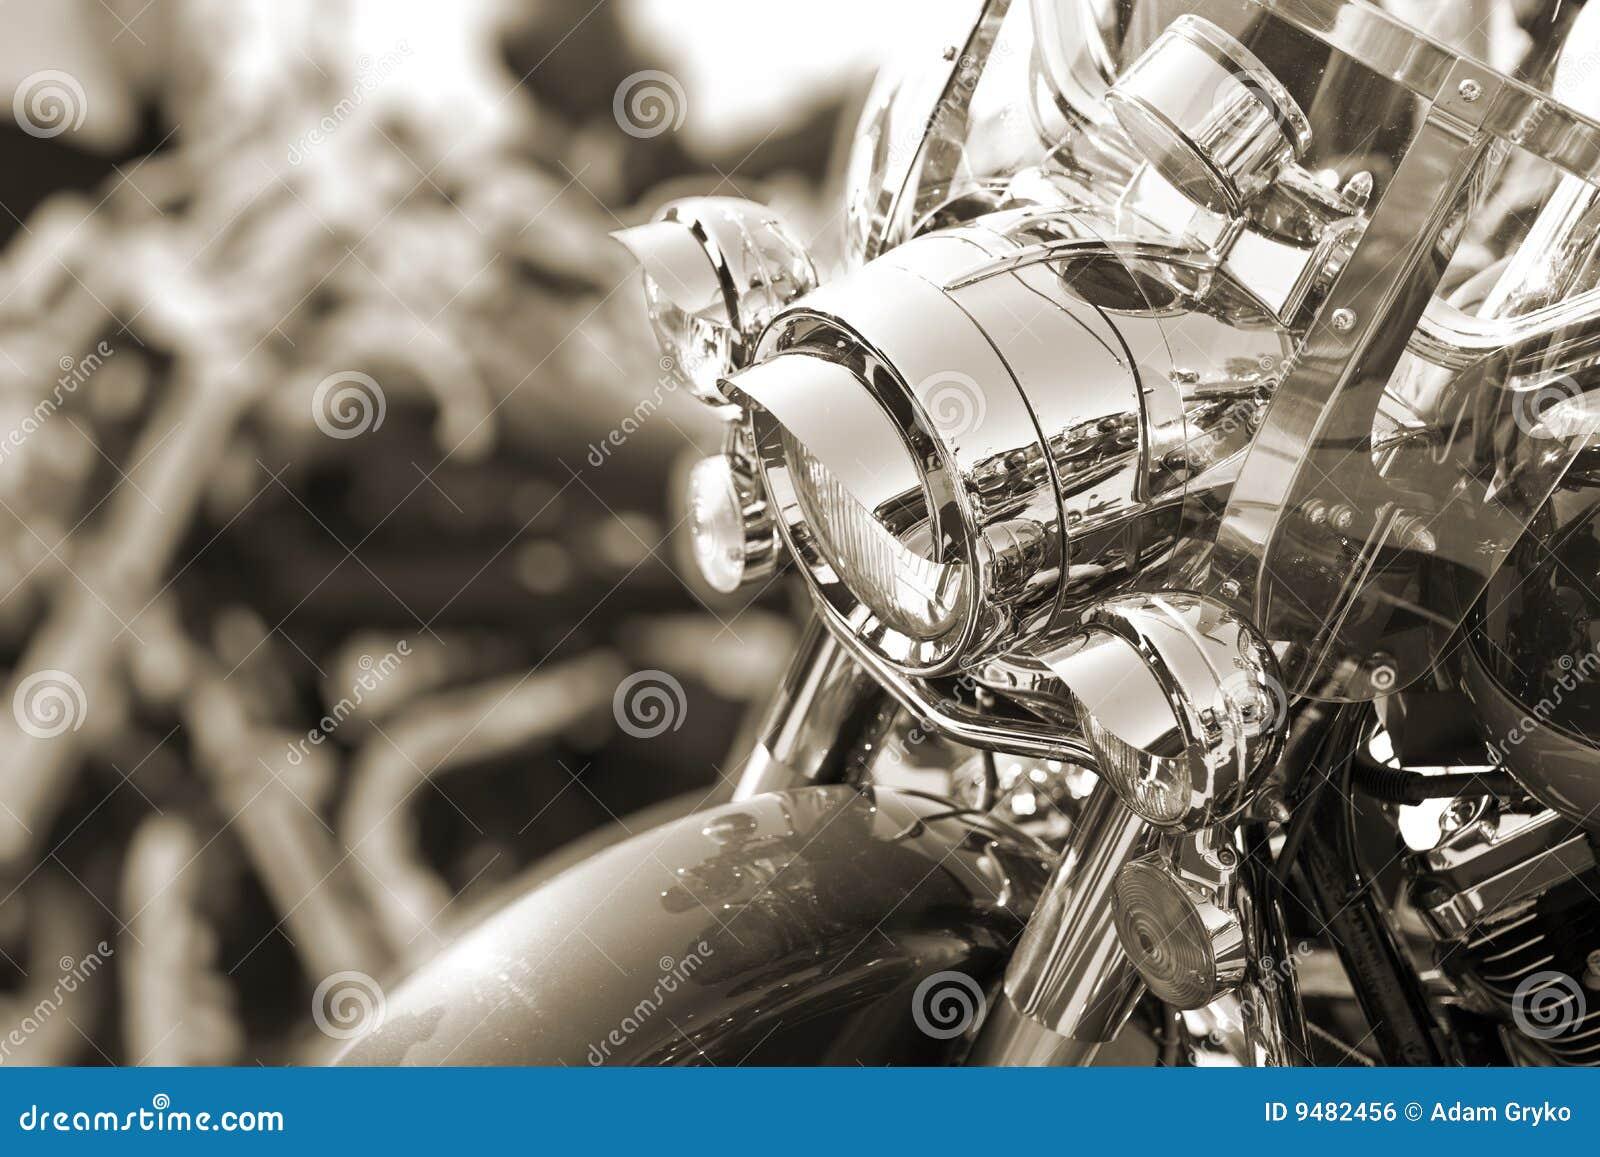 Lâmpada principal do velomotor